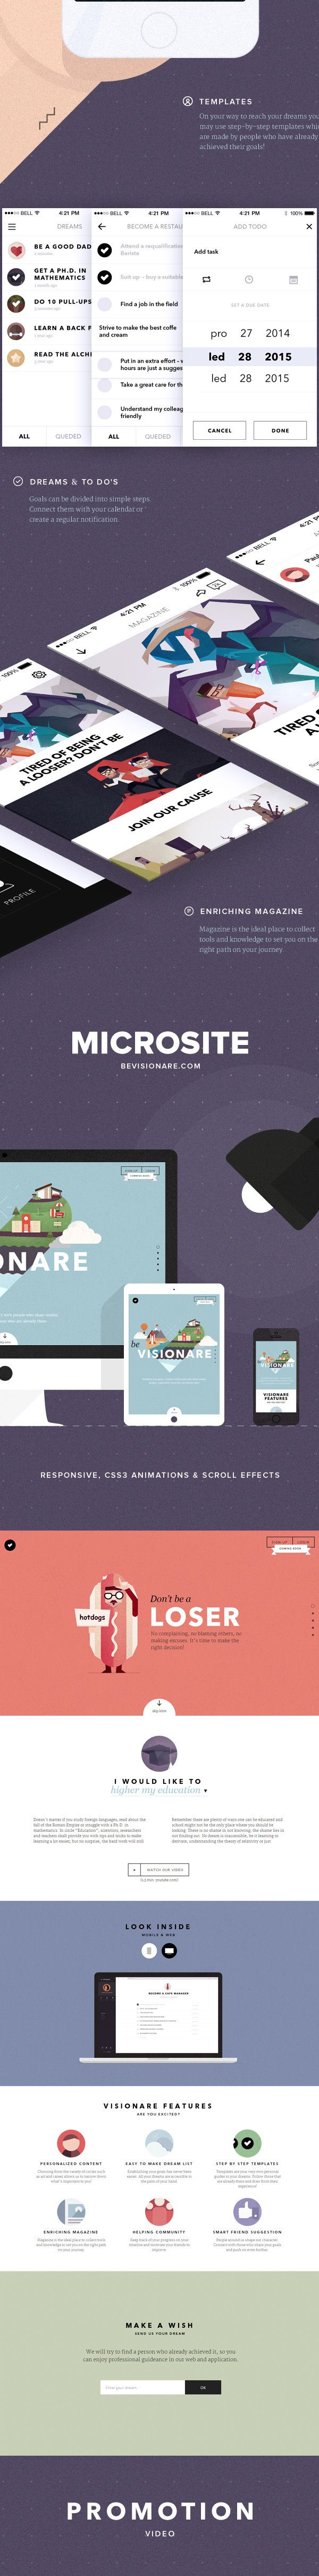 Visionare IOS Mobile App on Behance in UI